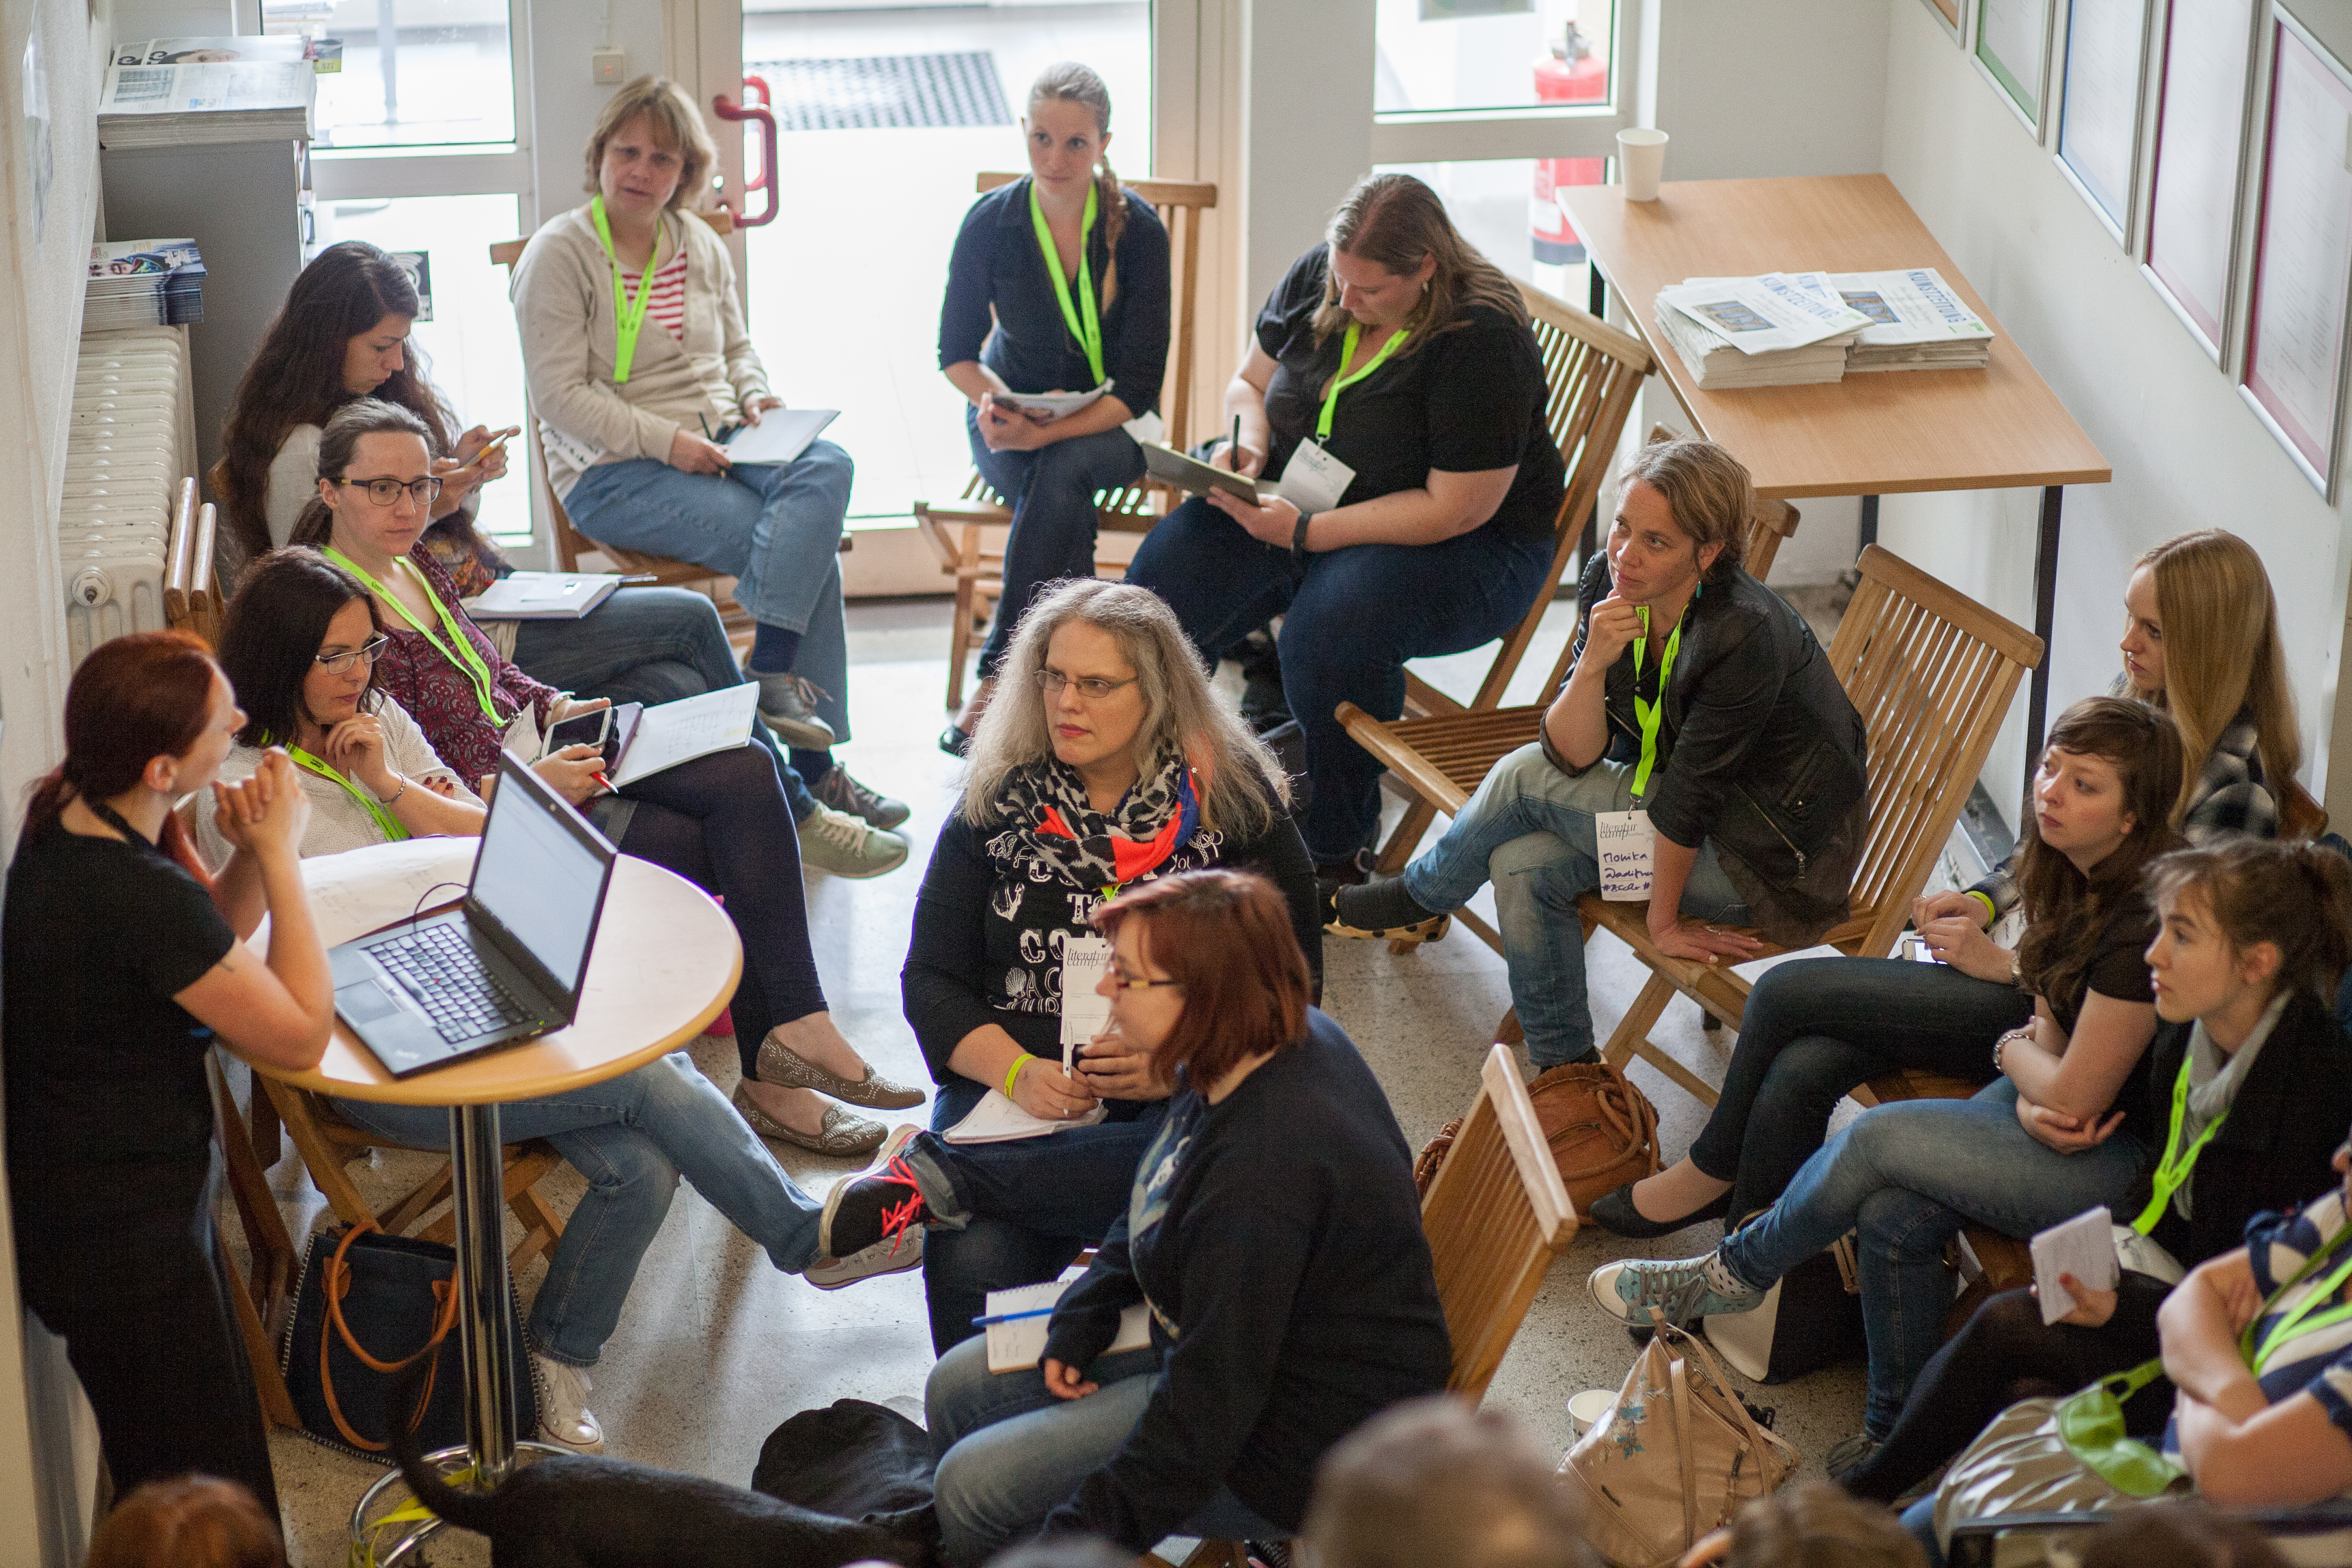 Eine Sitzung während des Literaturcamps. Fotos: Valentin Bachem/ https://www.flickr.com/photos/vbachem/sets/72157666945037904/ ,  @creativecommons CC-BY 2.0/ : https://creativecommons.org/licenses/by/2.0/de/